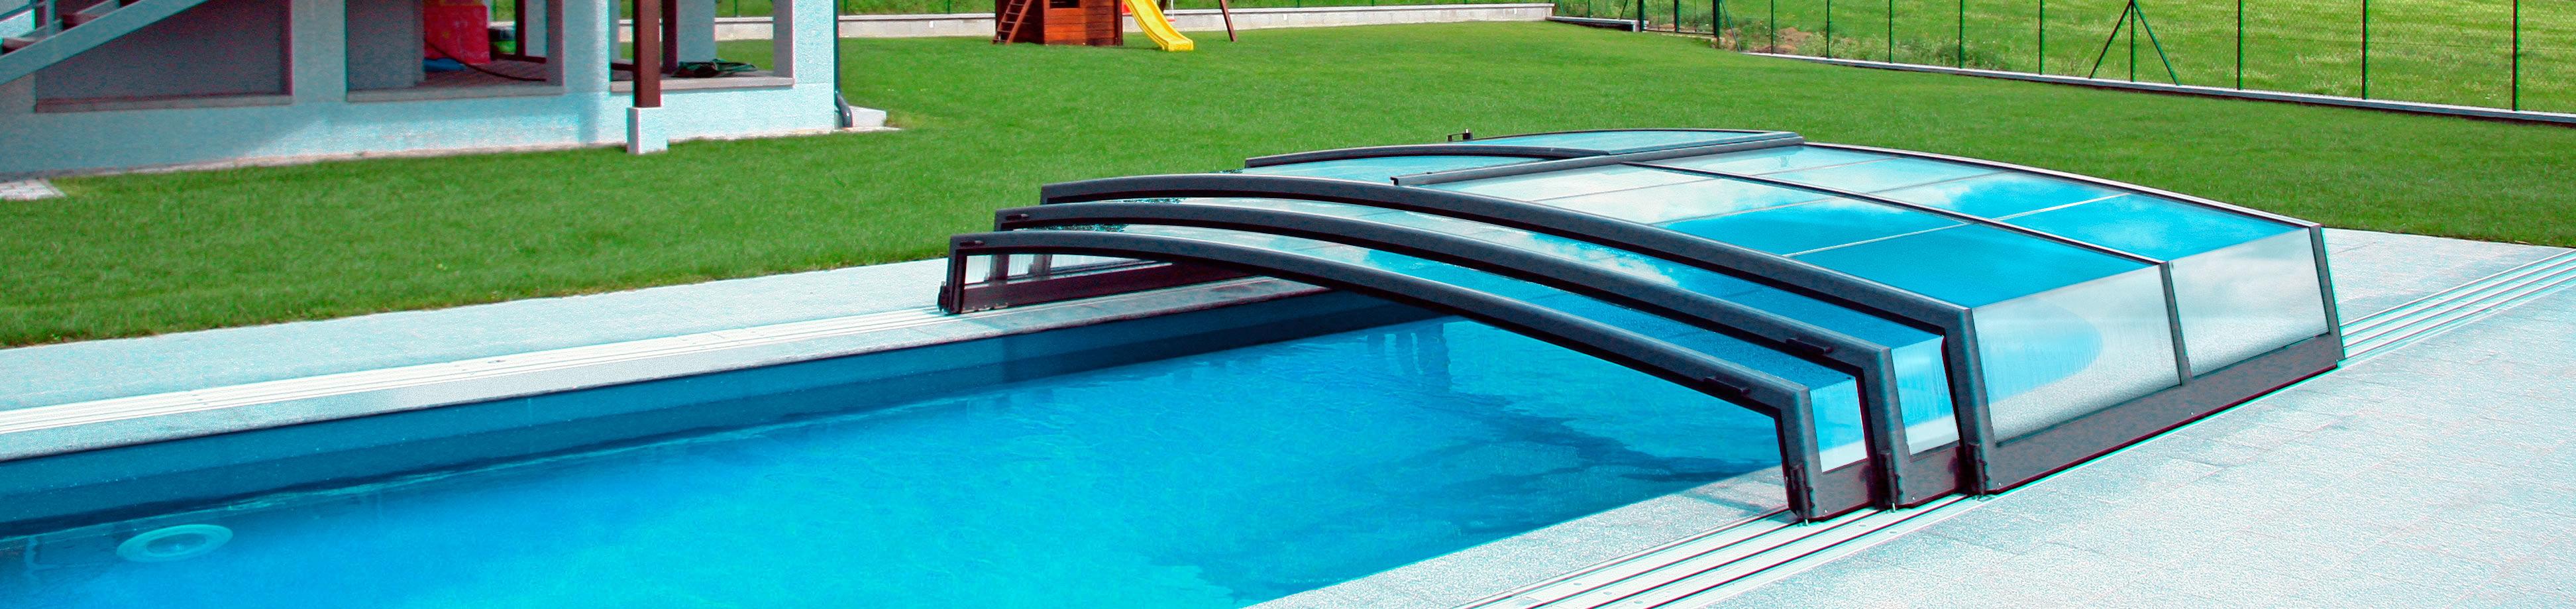 zwembadoverkappingen terrasoverkappingen axess europe axess europe. Black Bedroom Furniture Sets. Home Design Ideas